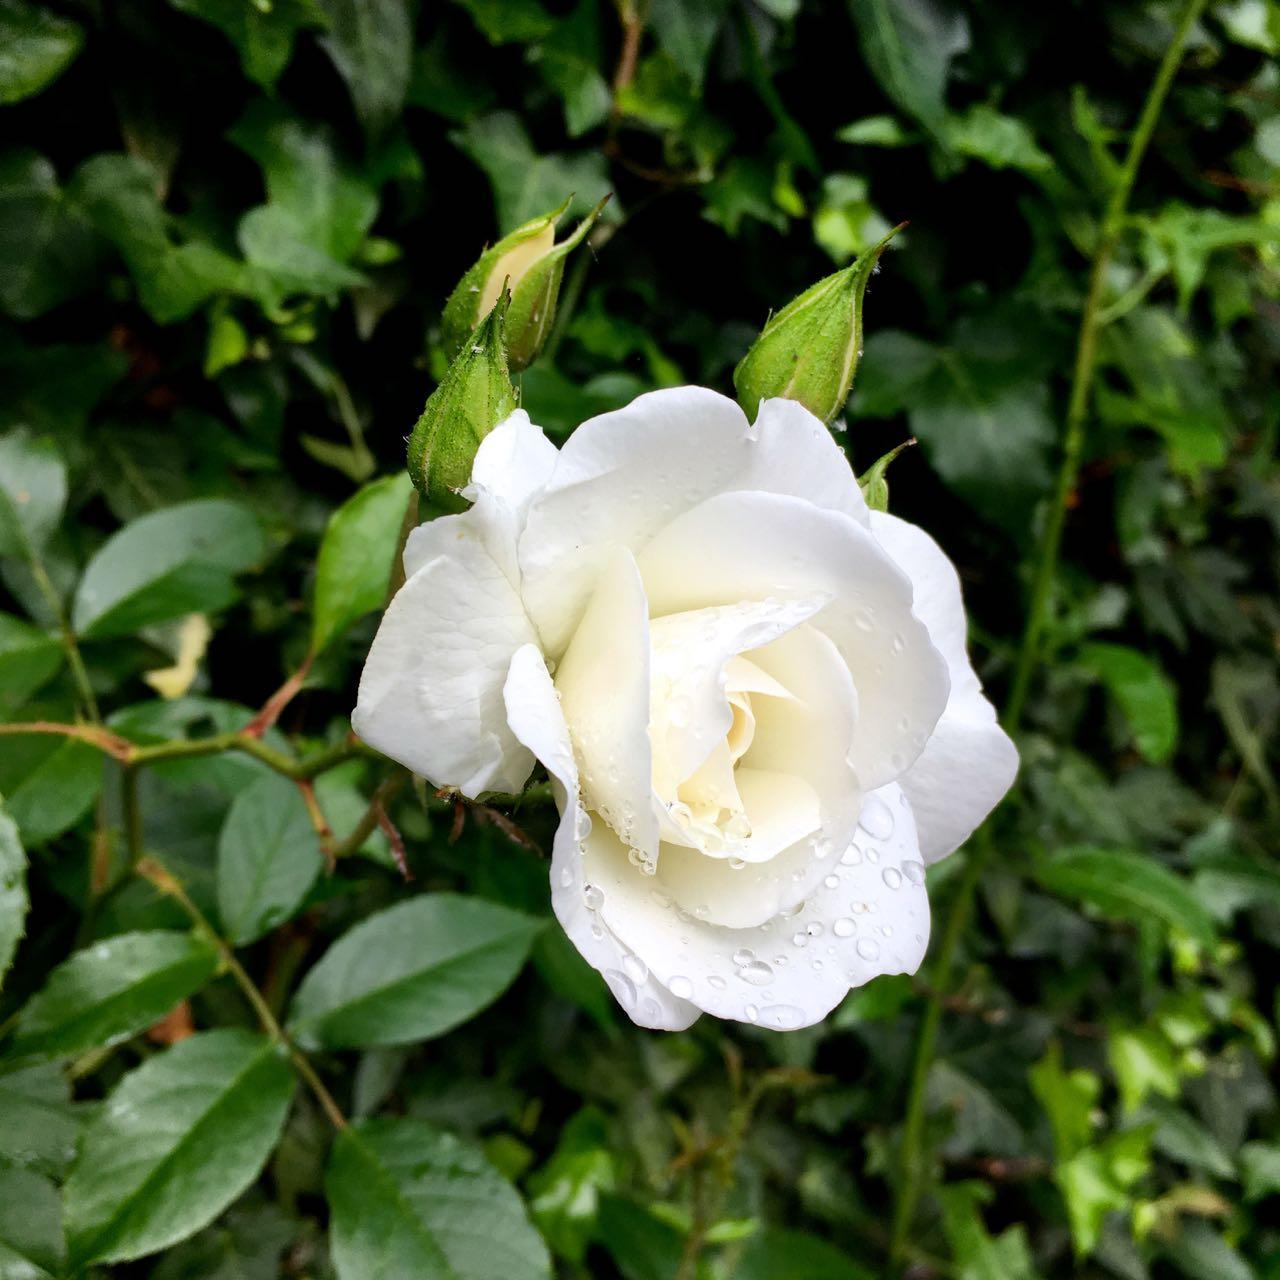 White roses too